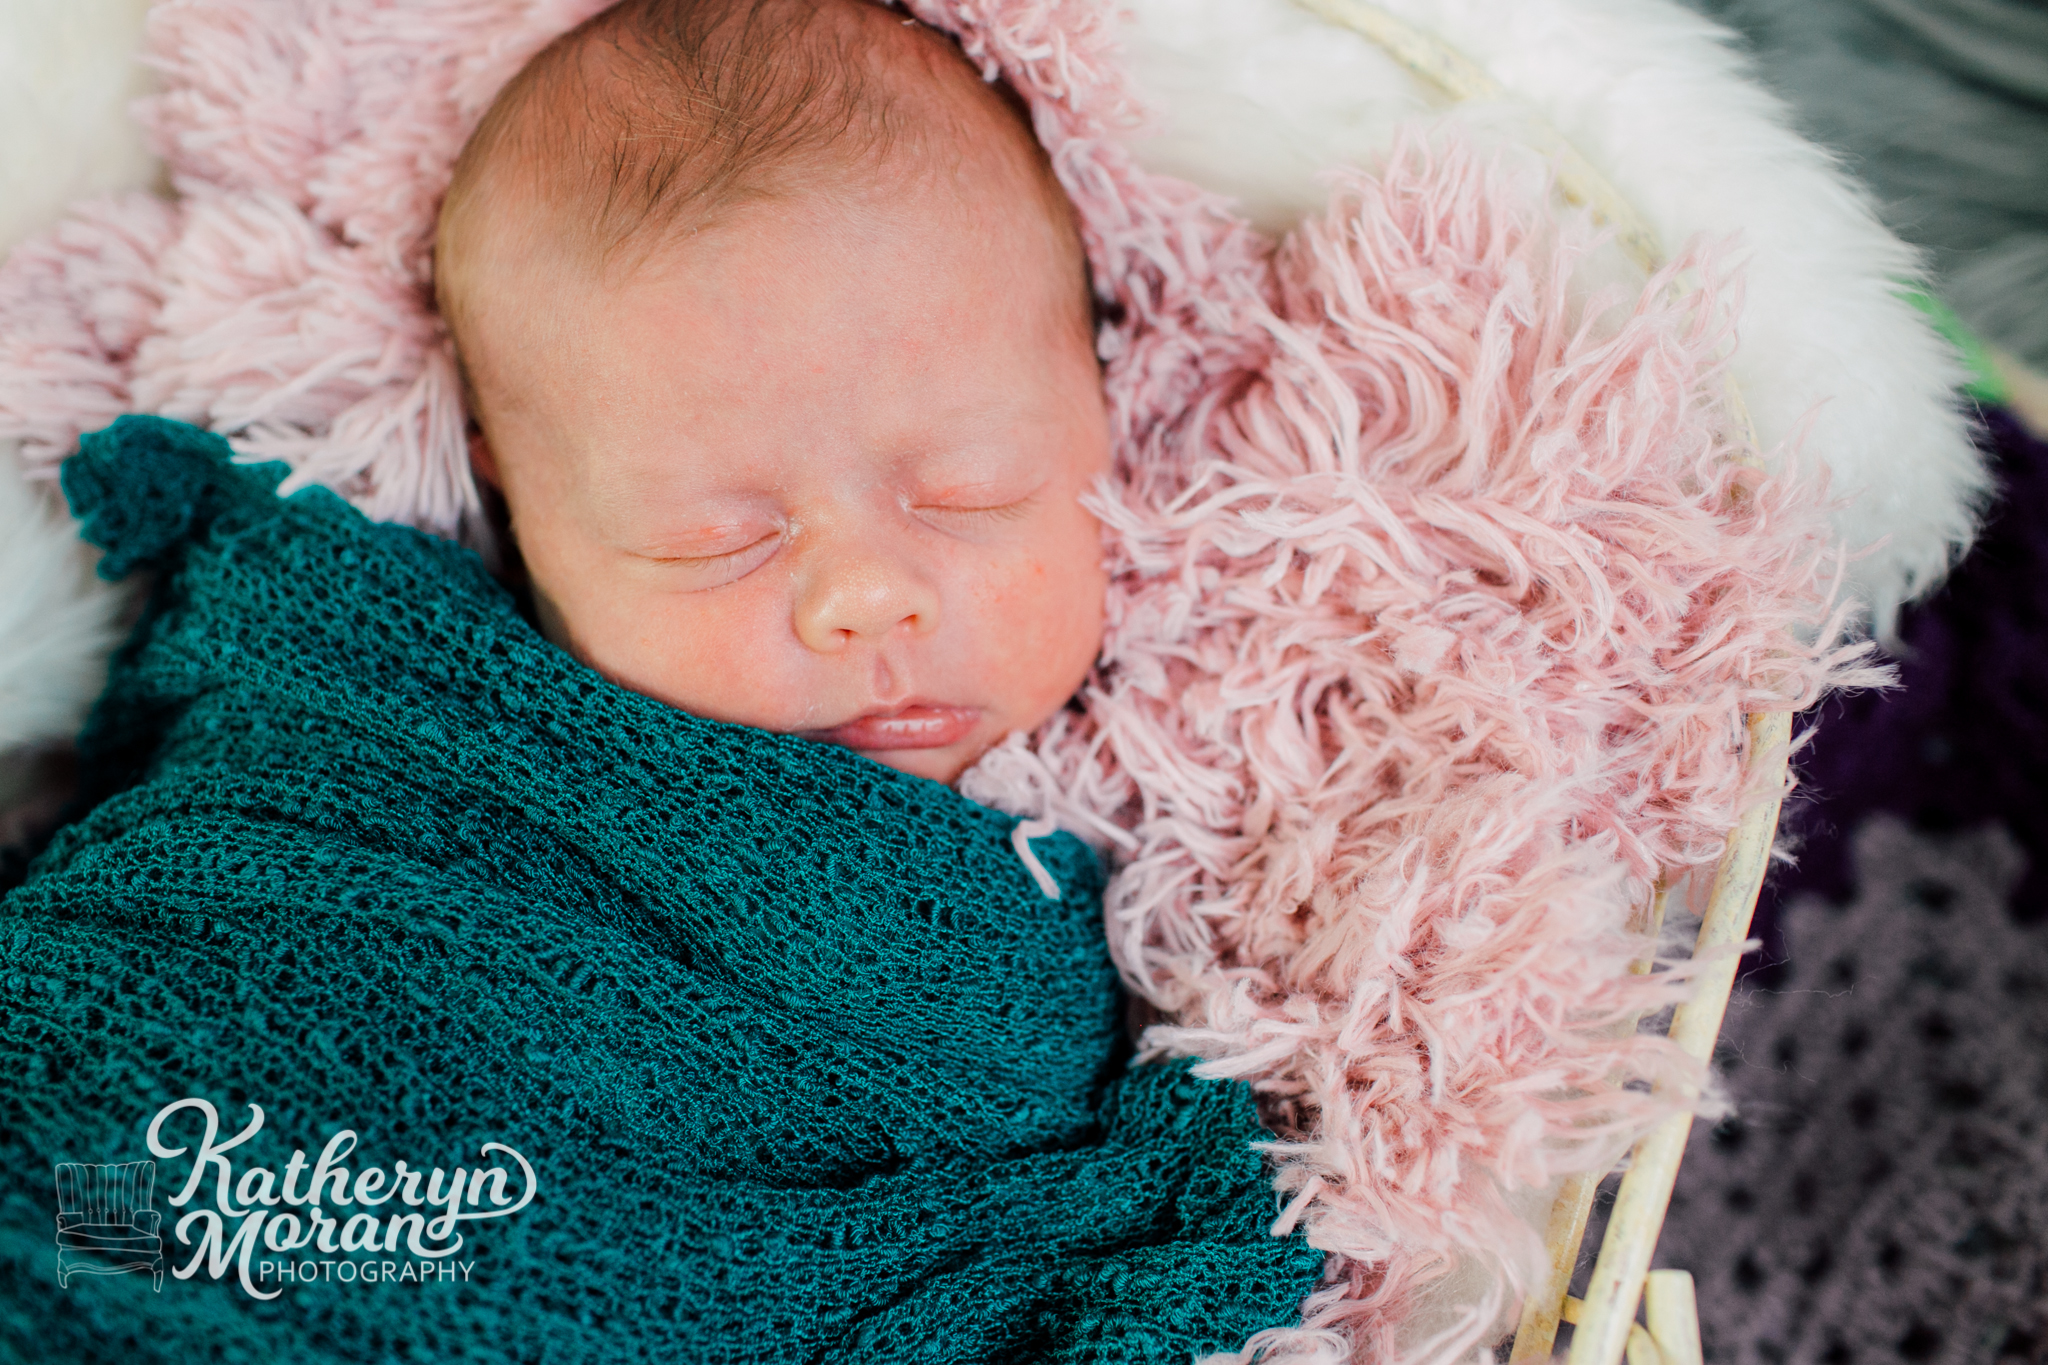 seattle-newborn-photographer-katheryn-moran-avery-malaspino-12.jpg